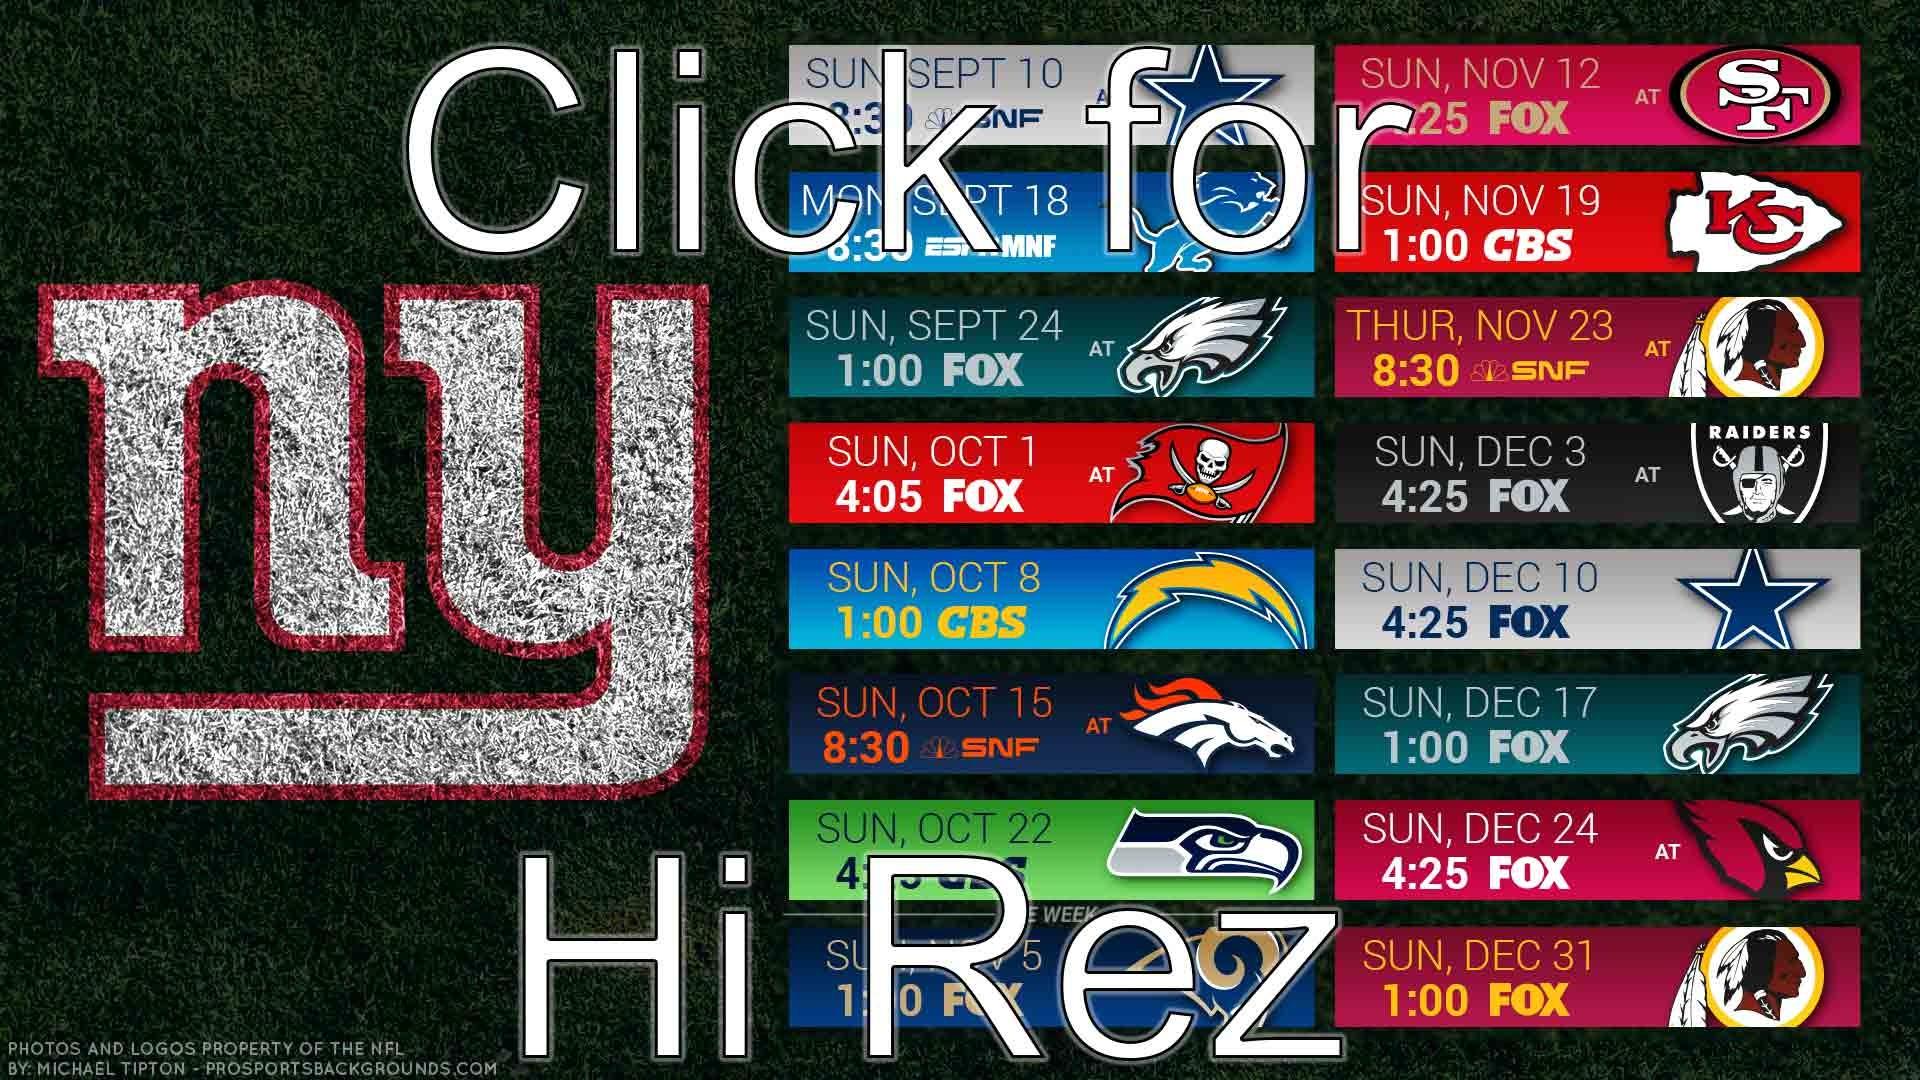 New York Giants 2017 schedule turf football logo wallpaper free pc desktop  computer …